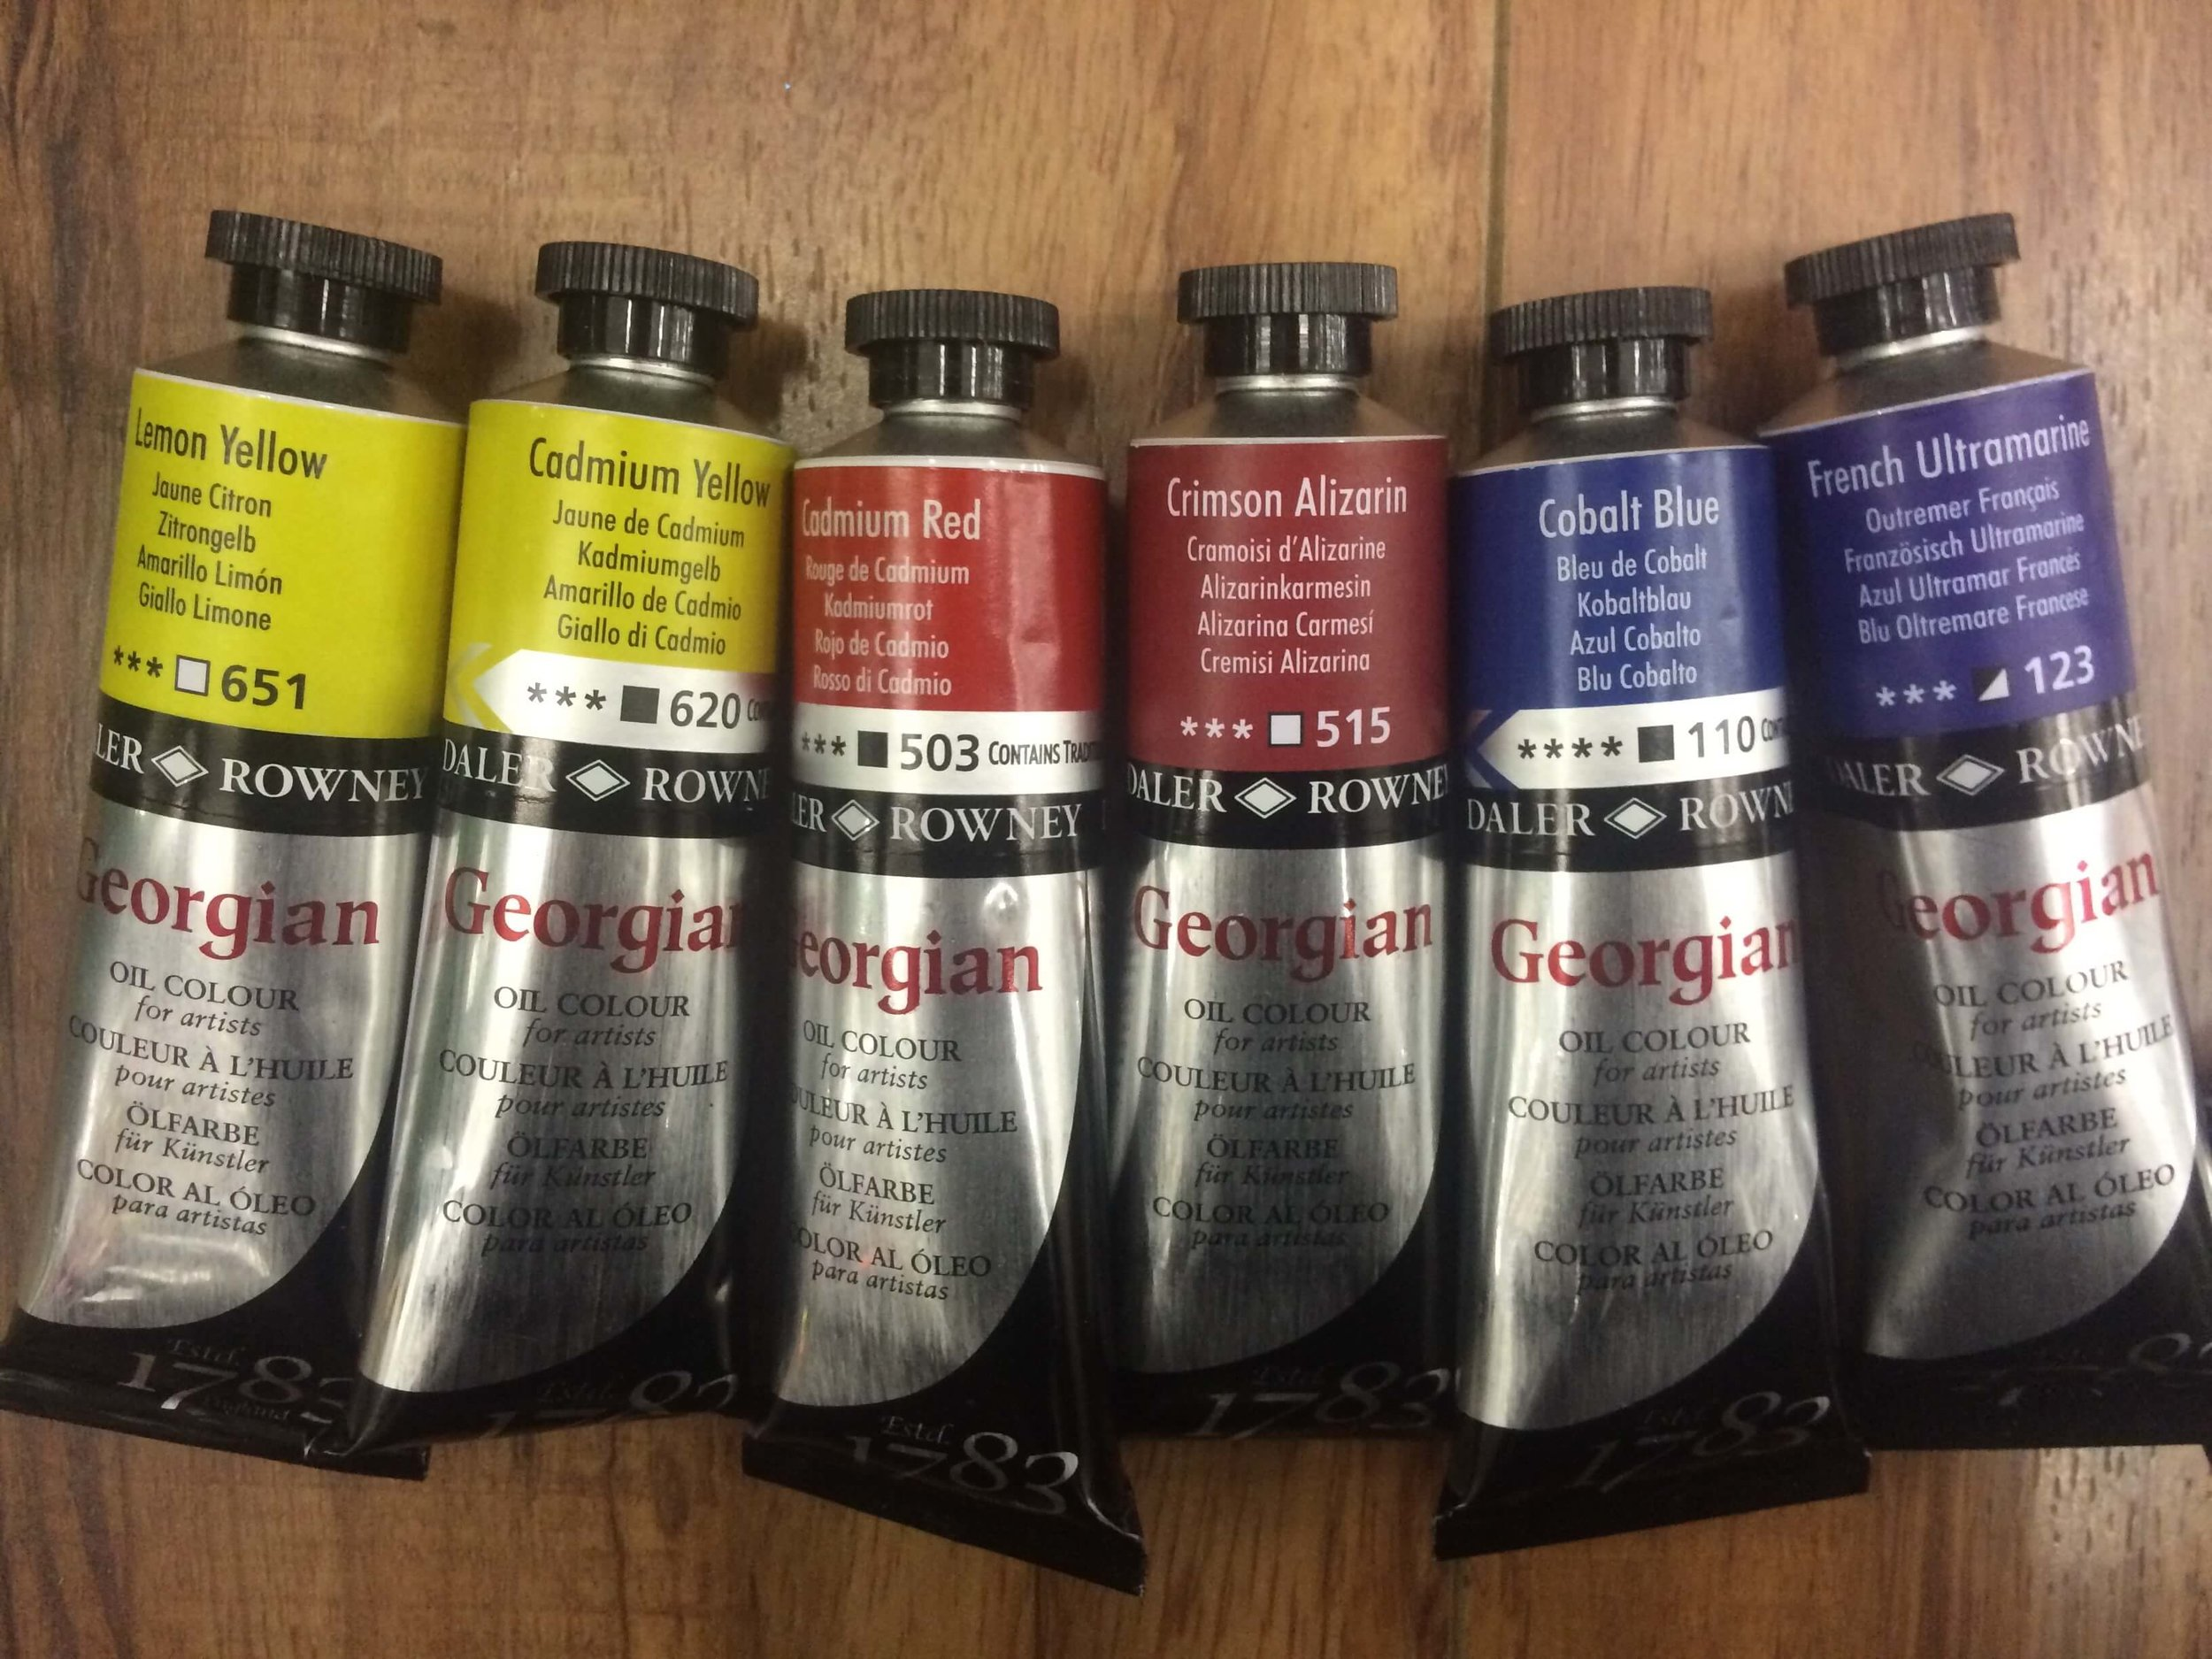 Daler Rowney | Georgian: Lemon Yellow, Cadmium Yellow, Cadmium Red, Crimson Alizarin, Cobalt Blue, French Ultramarine